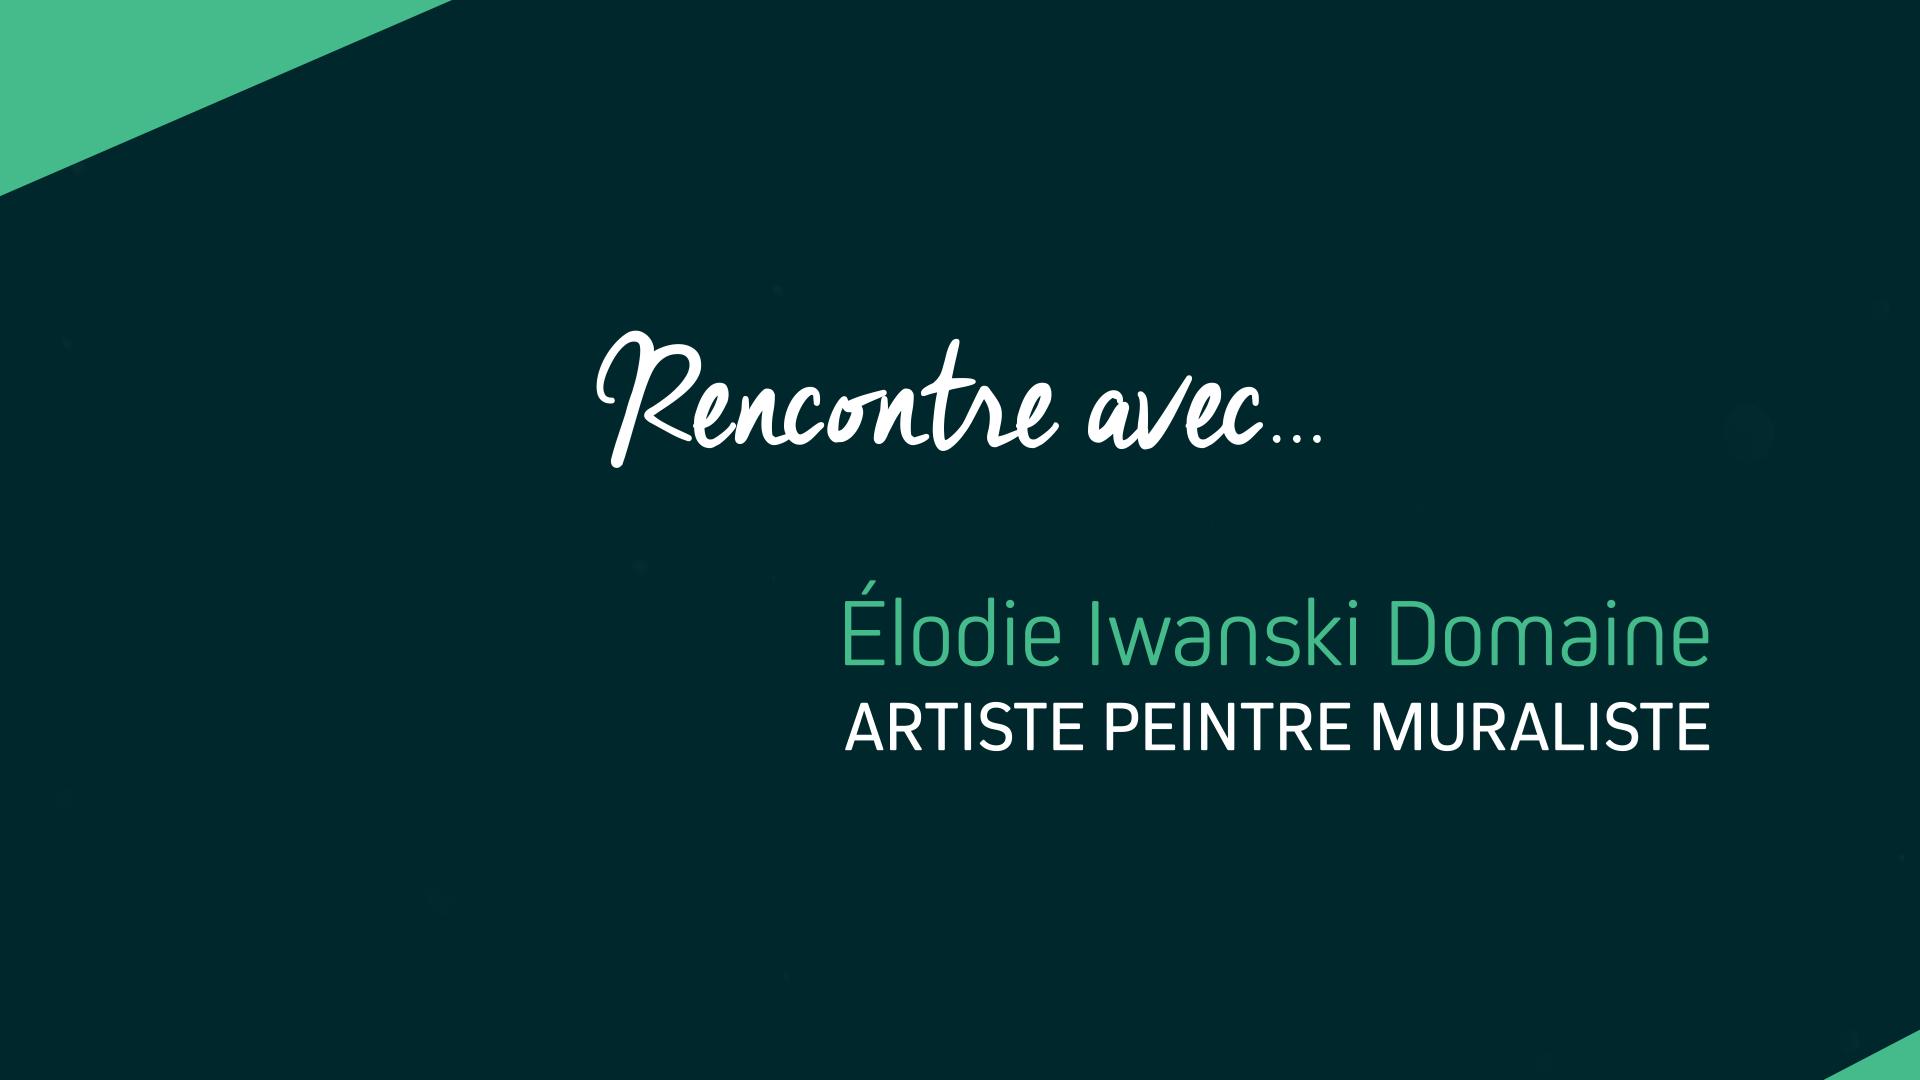 Interview | Artiste Peintre Muraliste